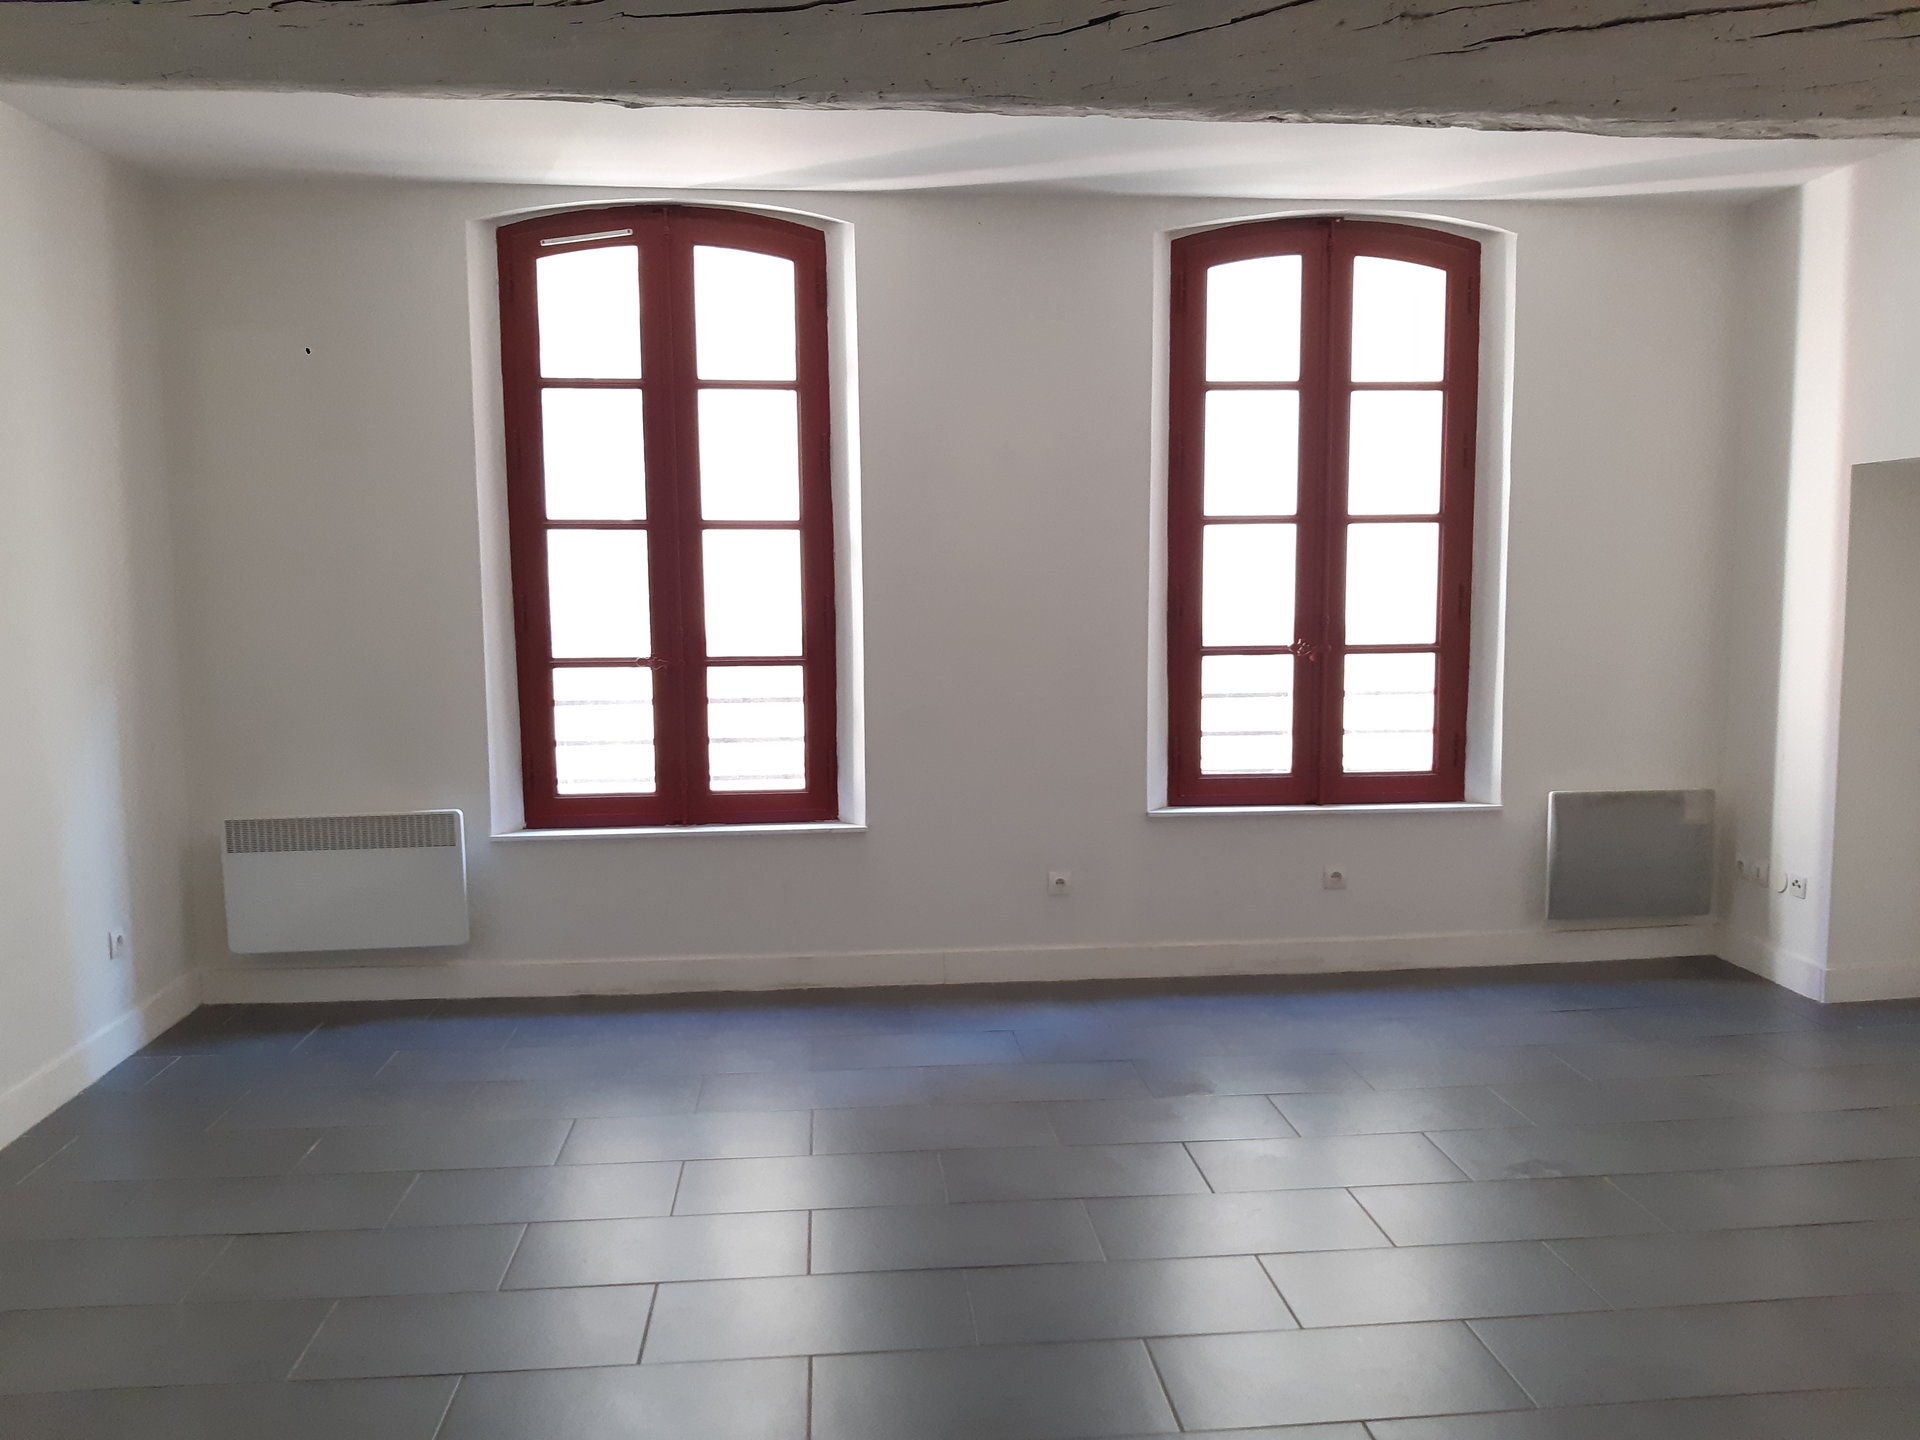 Location Appartement BEAUCAIRE Mandat : 0209